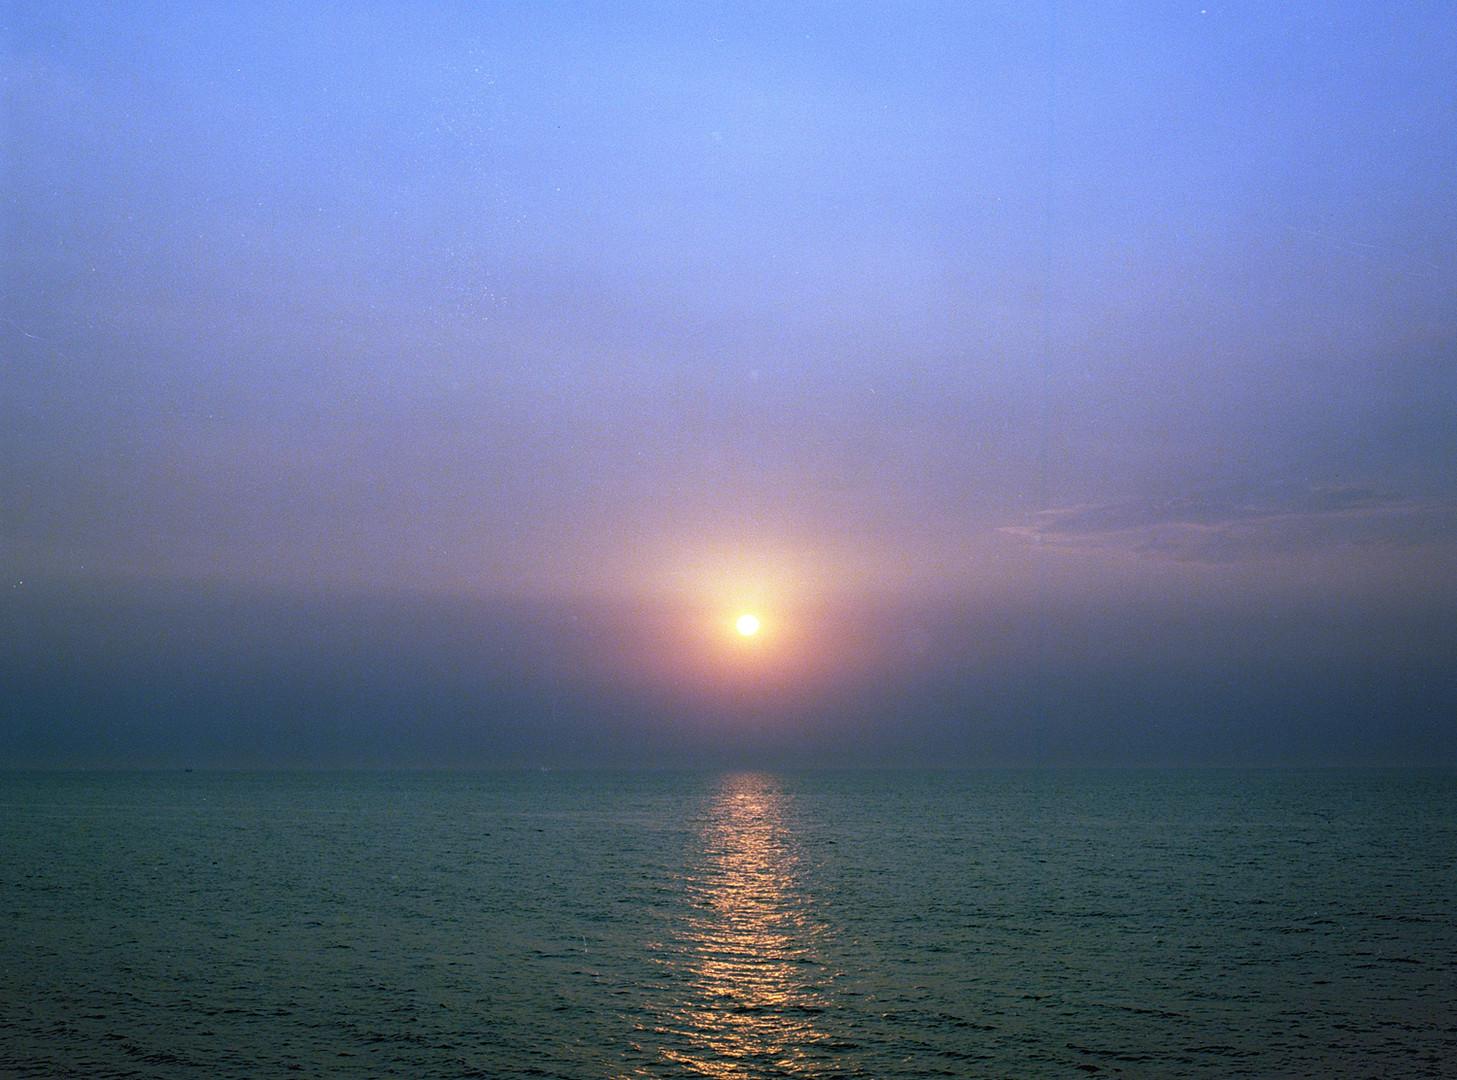 Moon over the Mediterranean sea